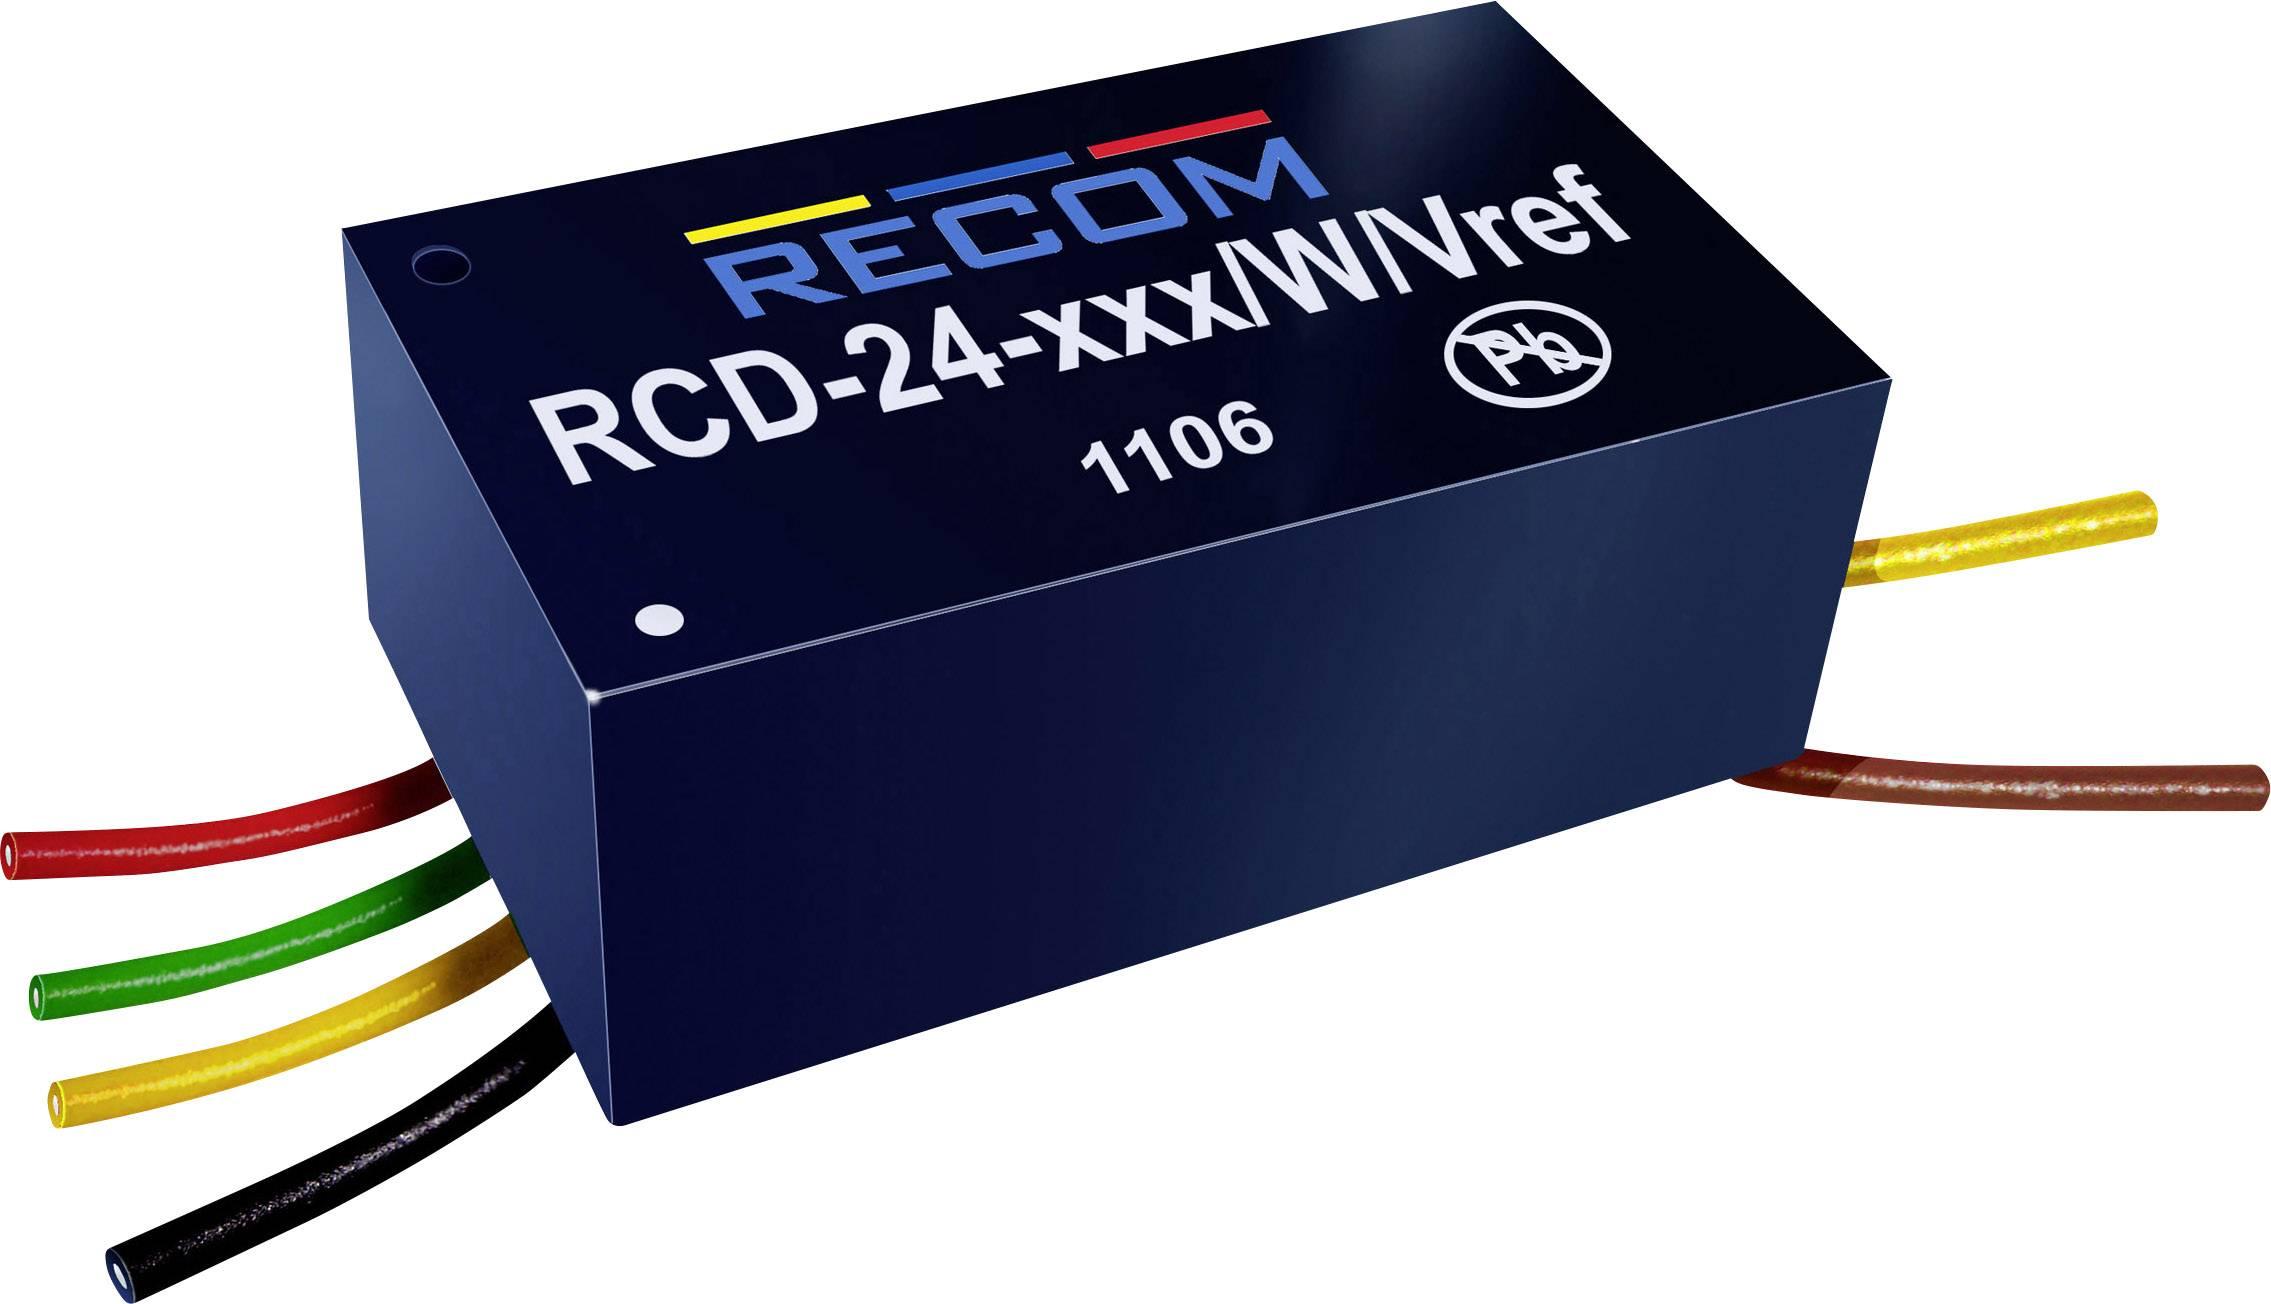 LED ovladač Recom Lighting RCD-24-0.35/W/X3, 4.5-36 V/DC